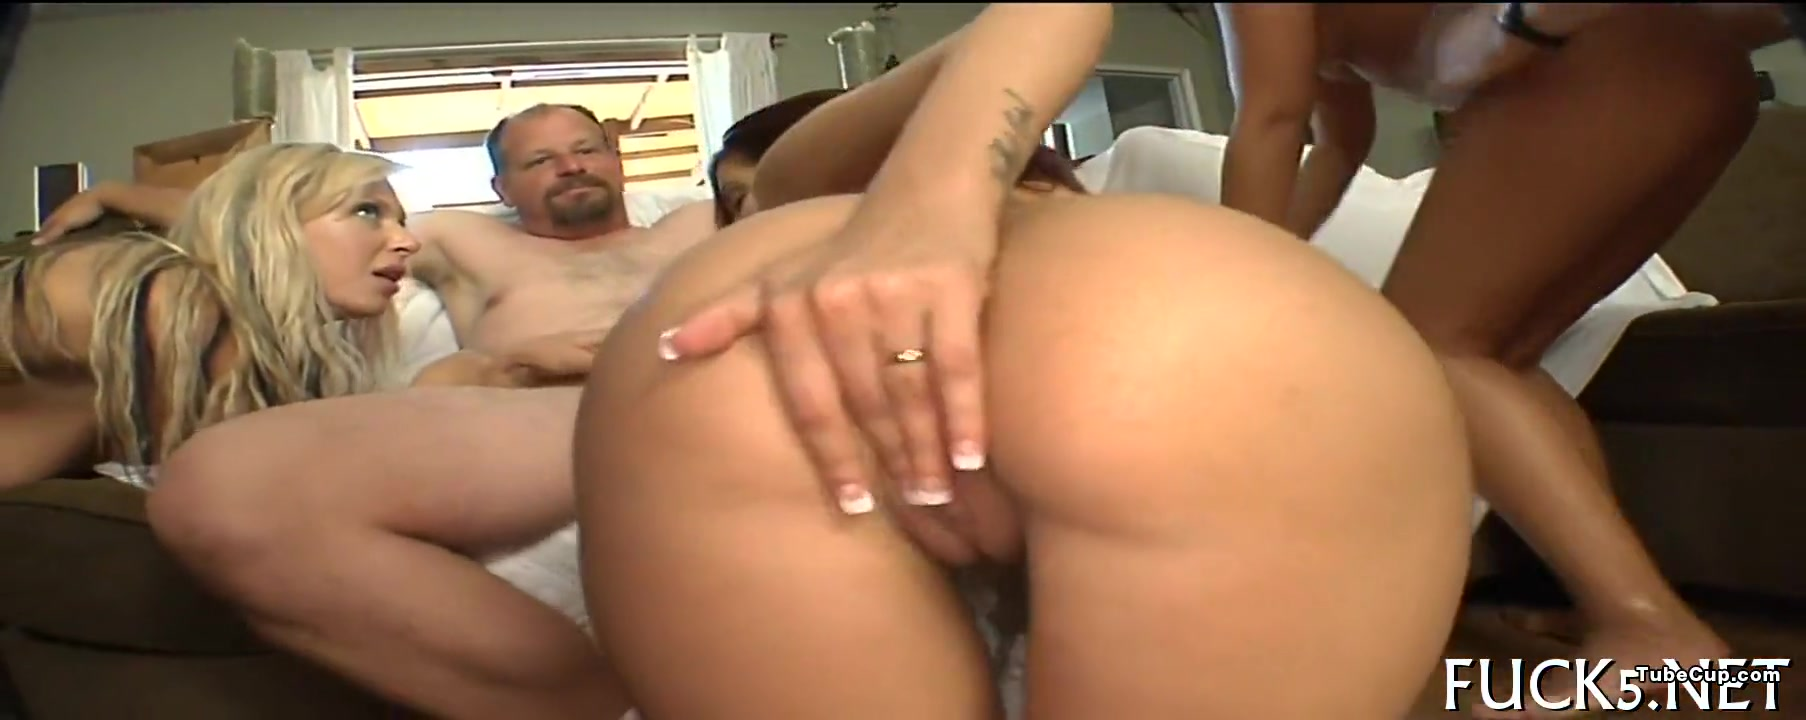 Impressive group sex